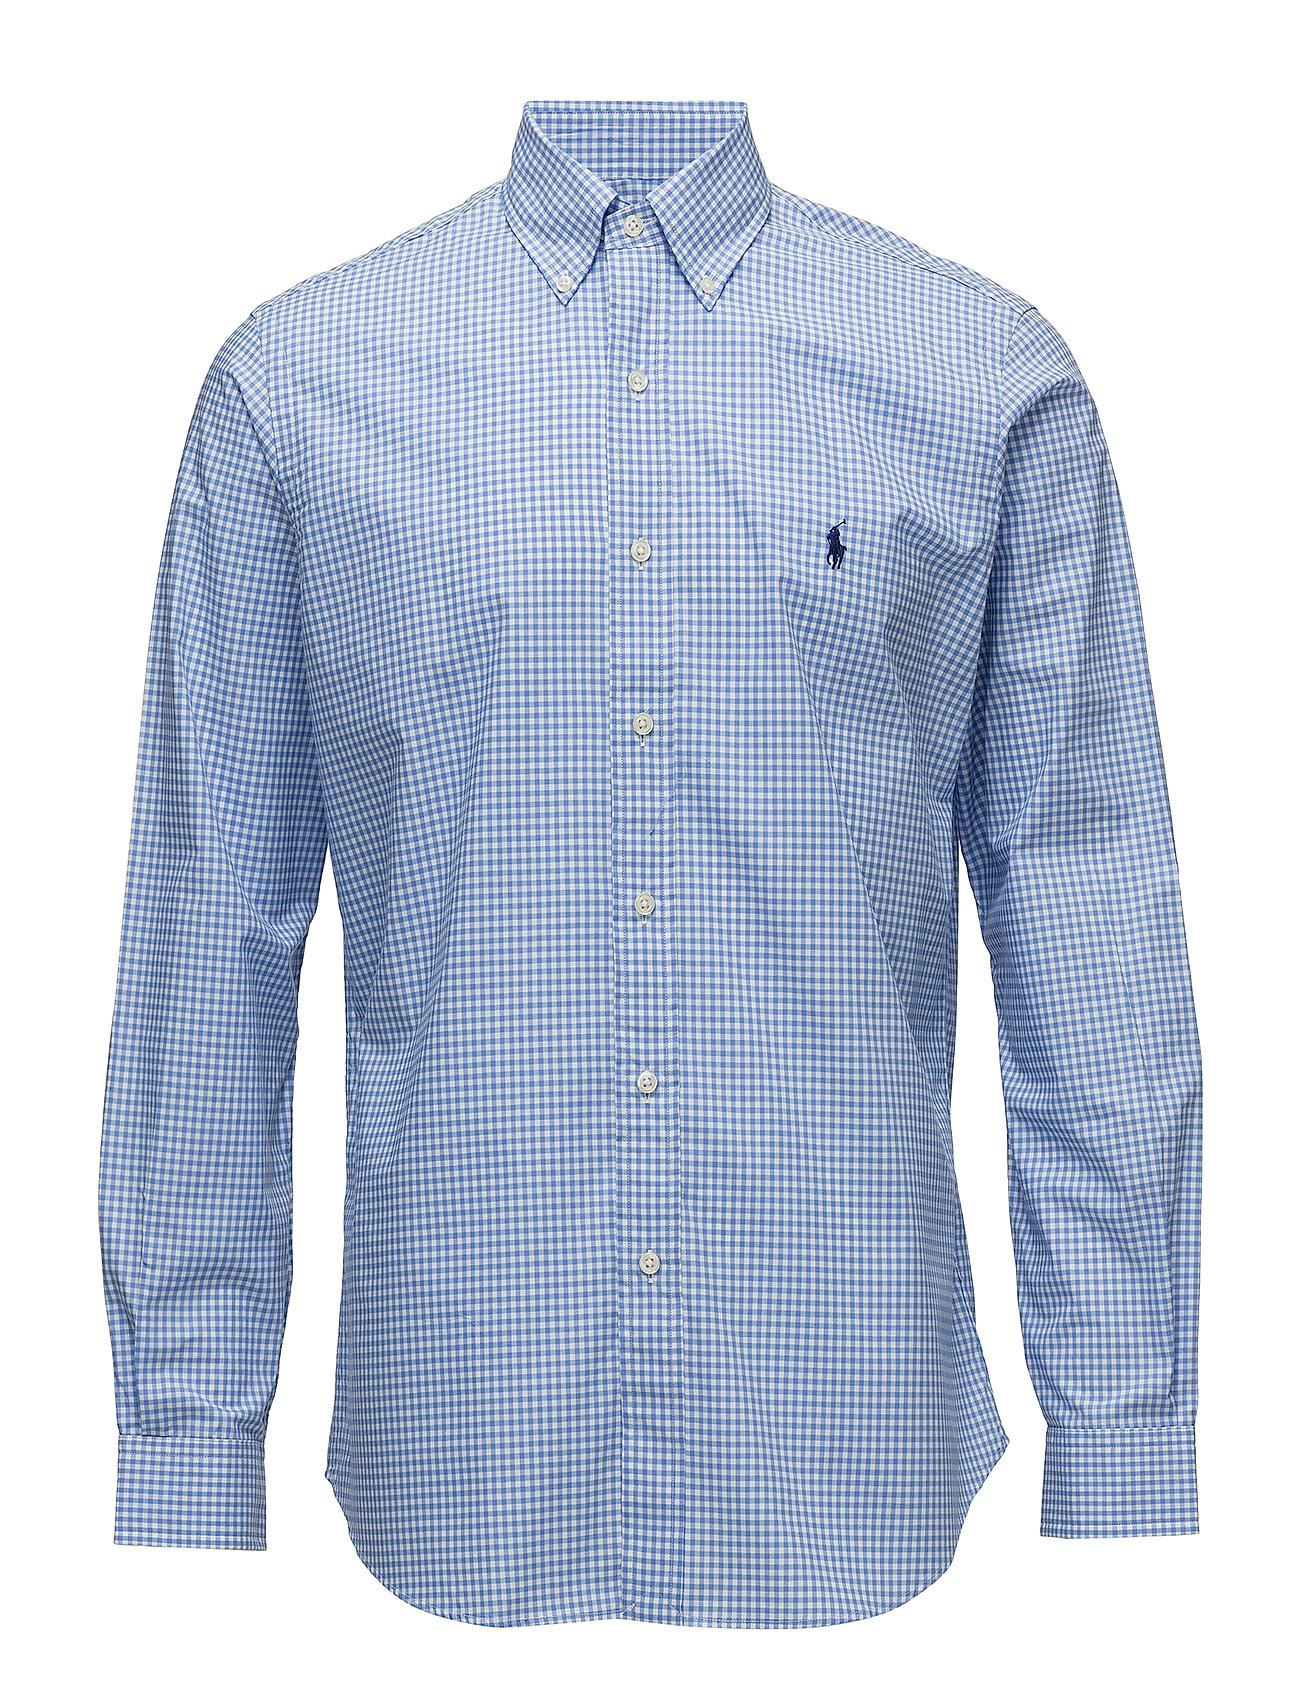 Polo Ralph Lauren BD PPC SPT-LONG SLEEVE-SPORT SHIRT - 2863 BLUE/WHITE C